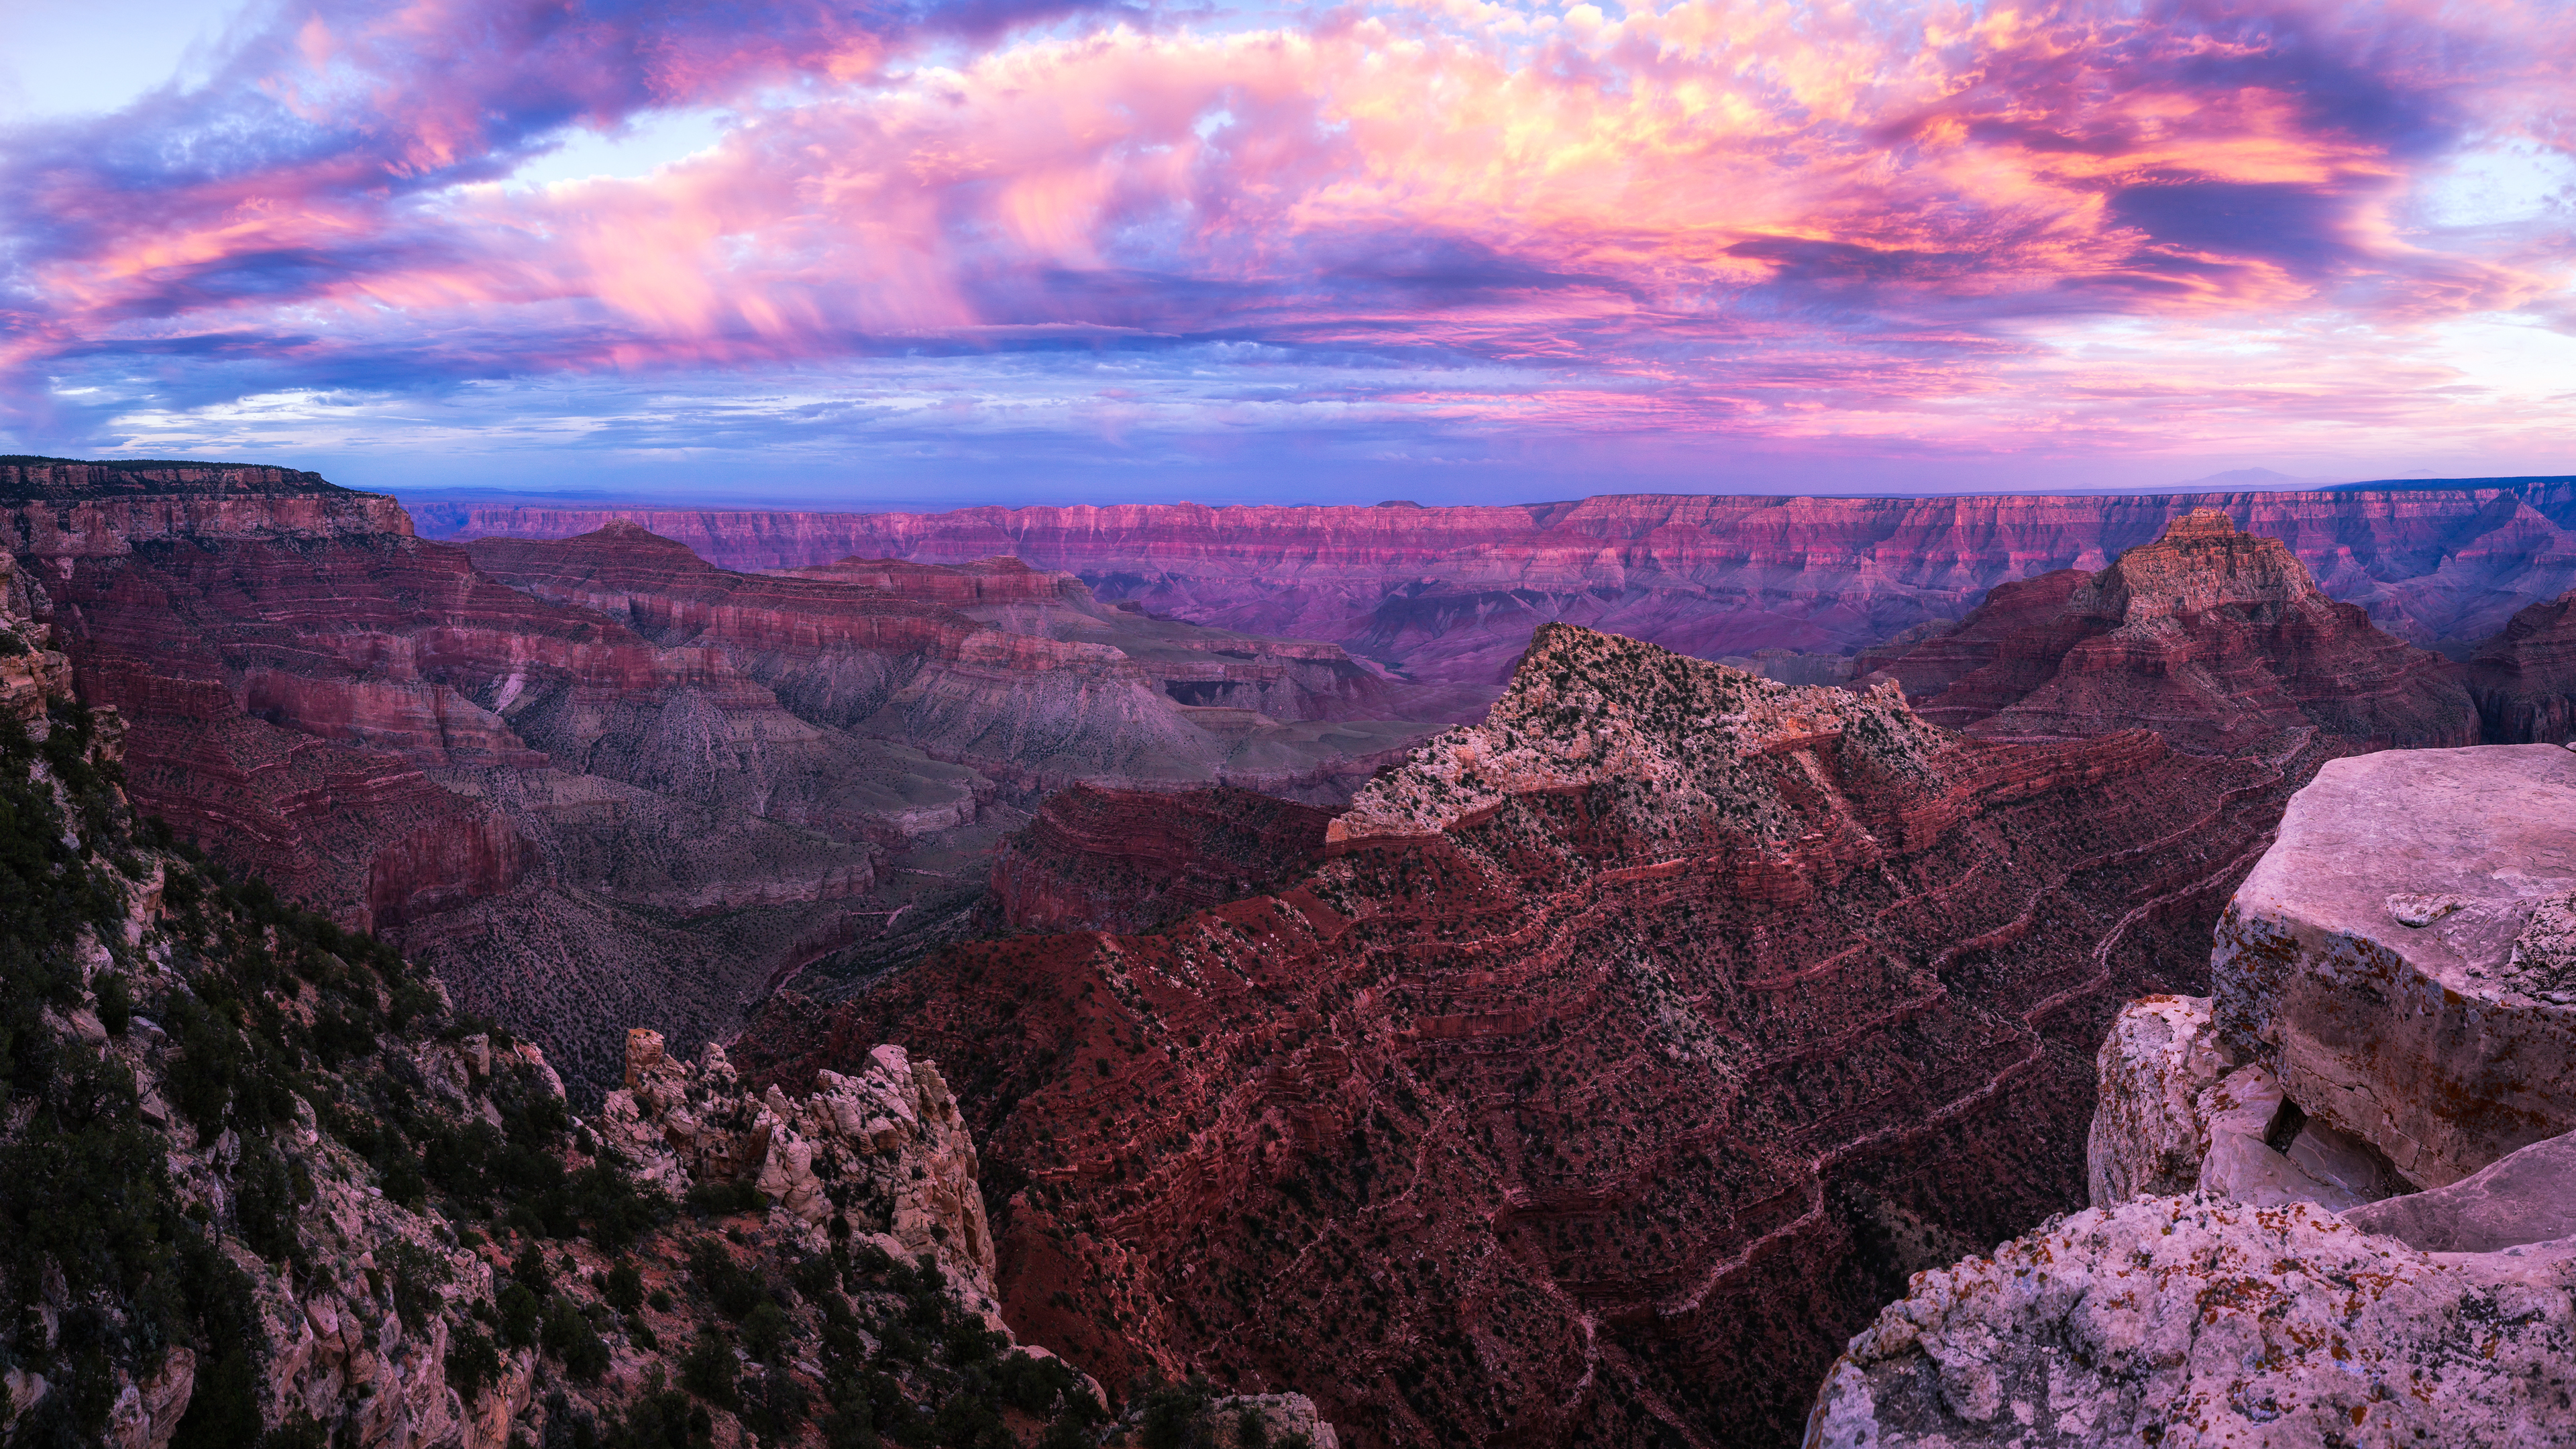 grand canyon sunset pano 1551644425 - Grand Canyon Sunset Pano - sunset wallpapers, nature wallpapers, hd-wallpapers, canyon wallpapers, 4k-wallpapers